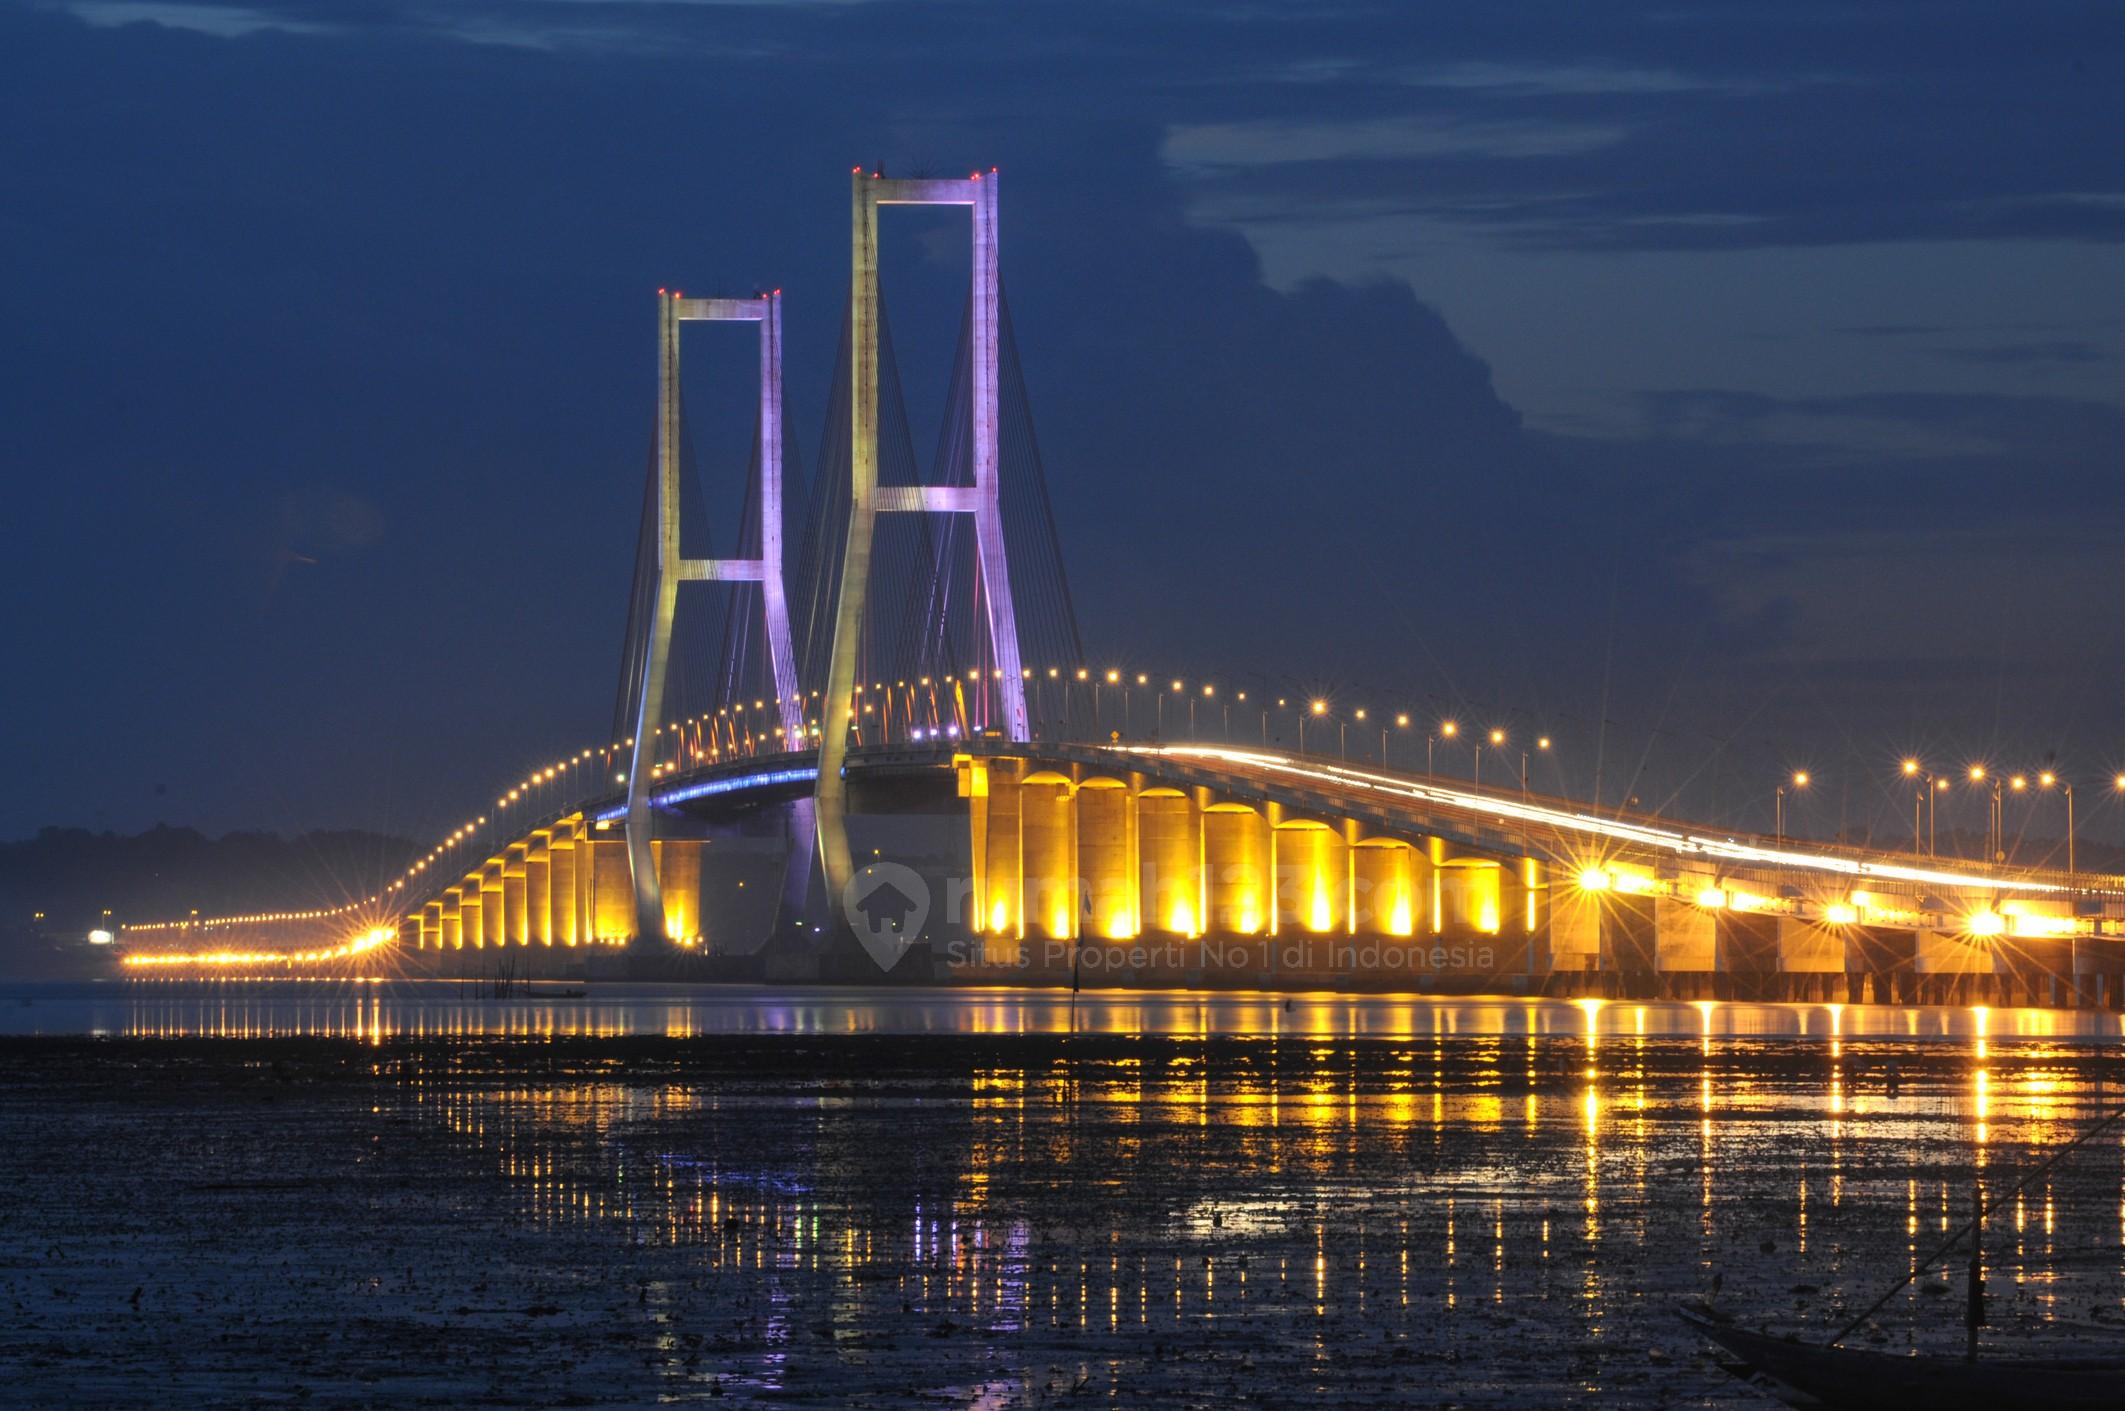 Image result for Jembatan suramadu